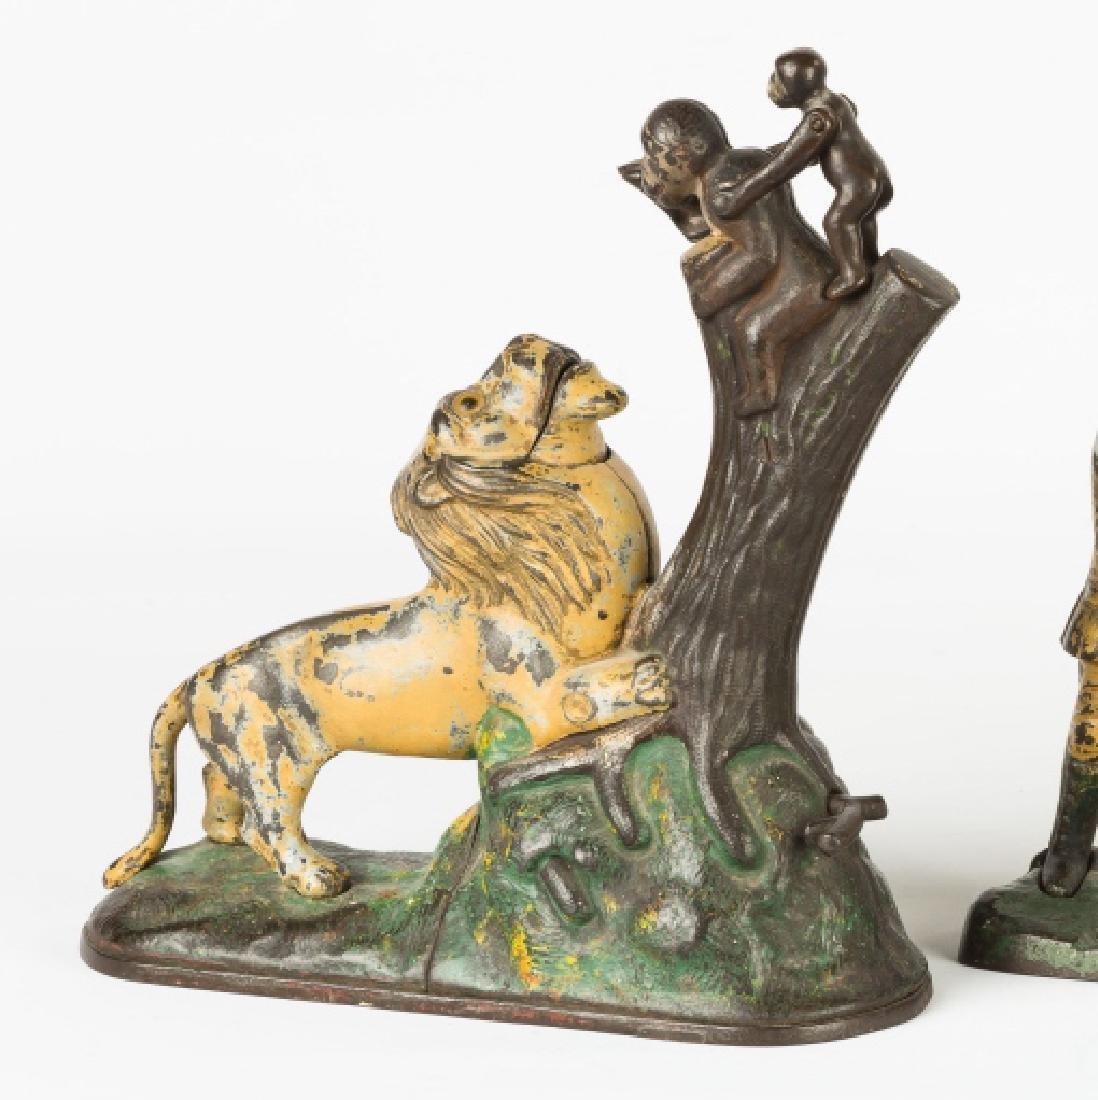 Lion and Monkey Cast Iron Mechanical Bank